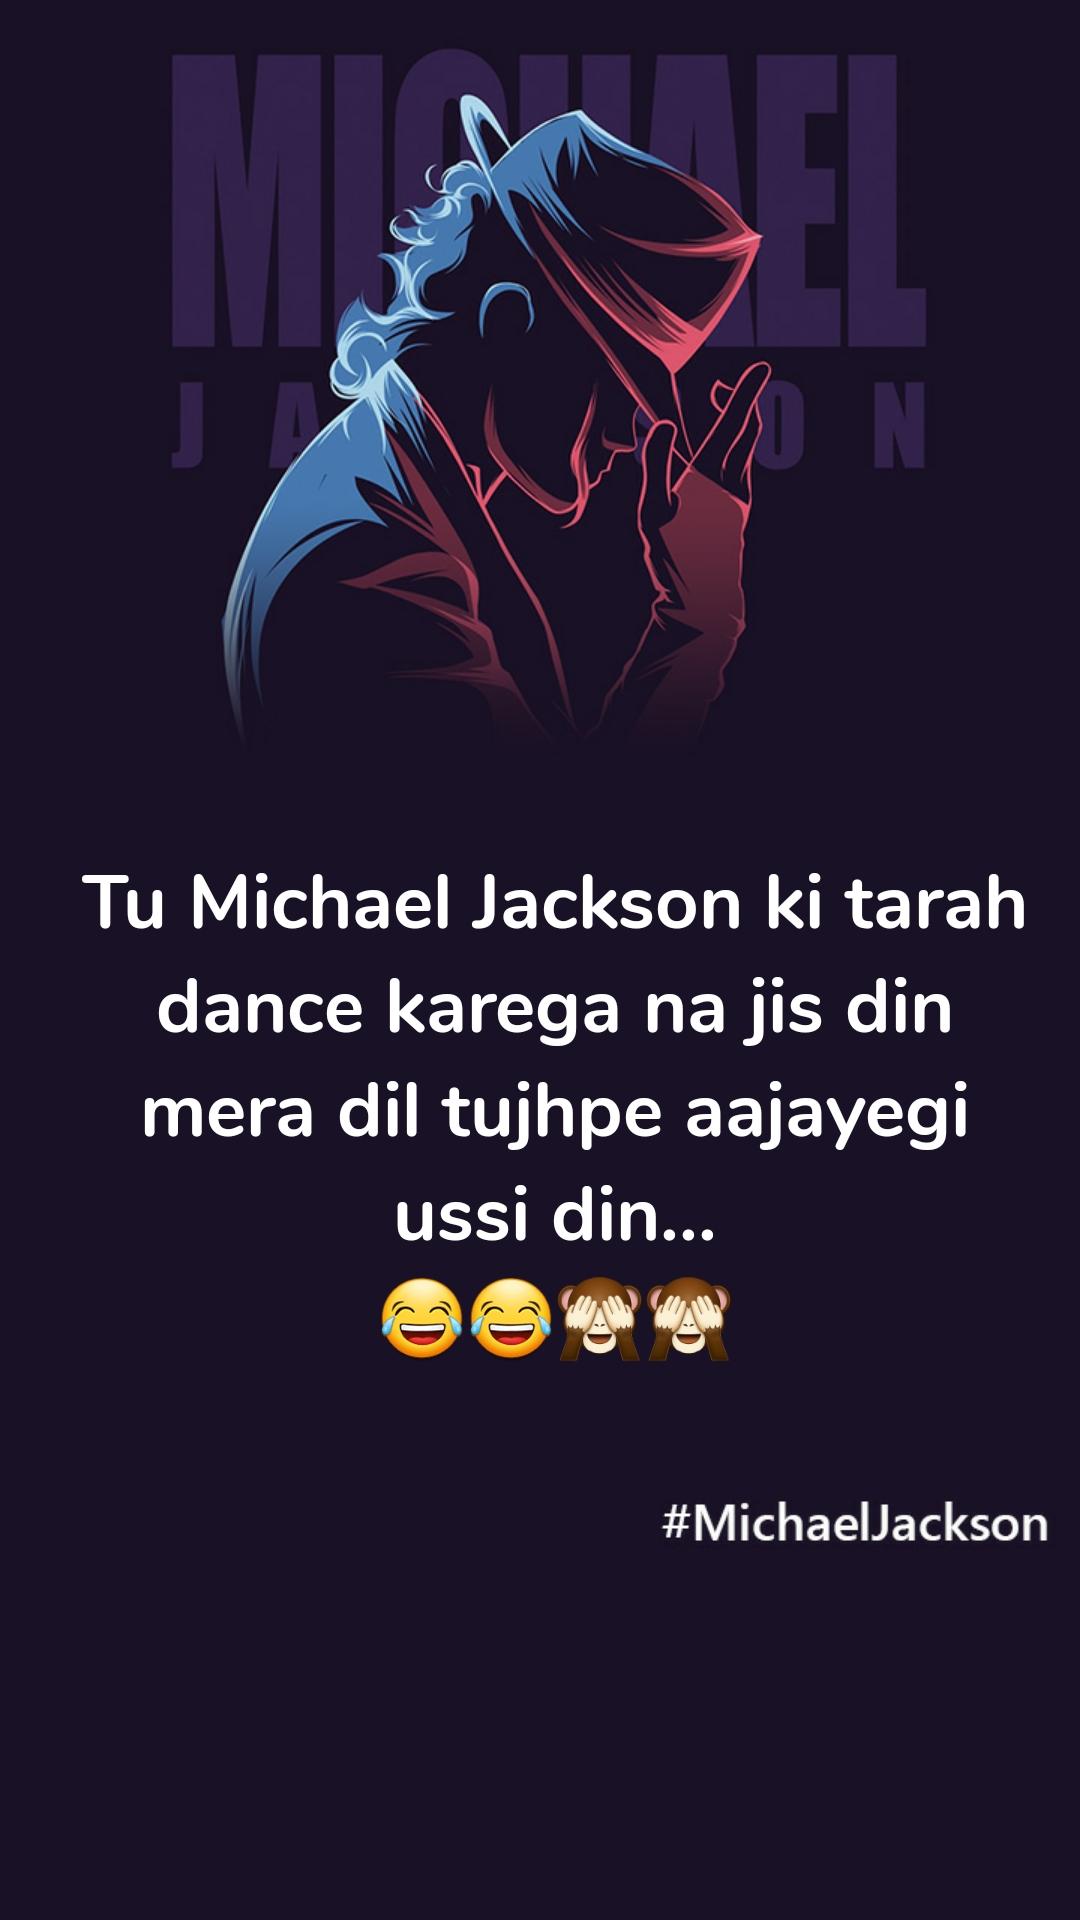 Tu Michael Jackson ki tarah dance karega na jis din mera dil tujhpe aajayegi ussi din... 😂😂🙈🙈